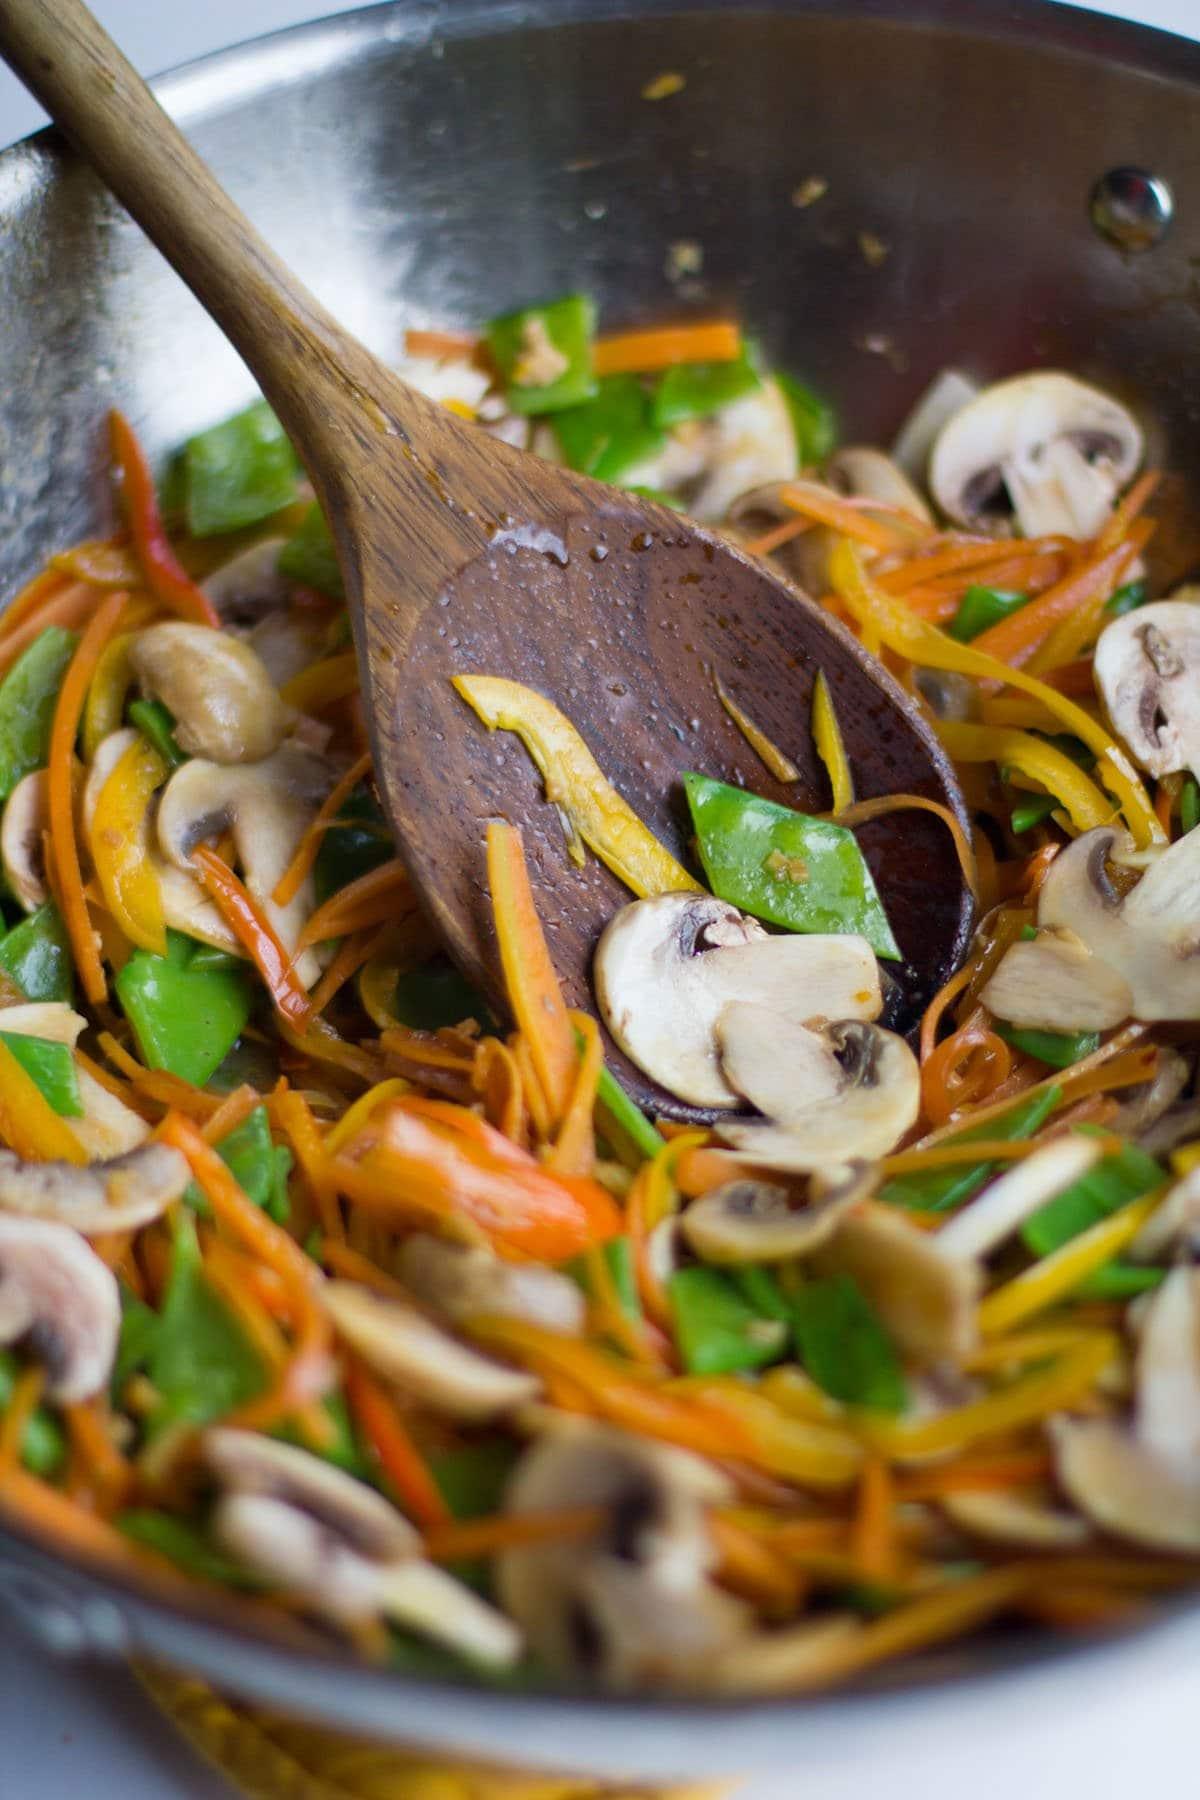 Wooden spoon stirring vegetables in a pan